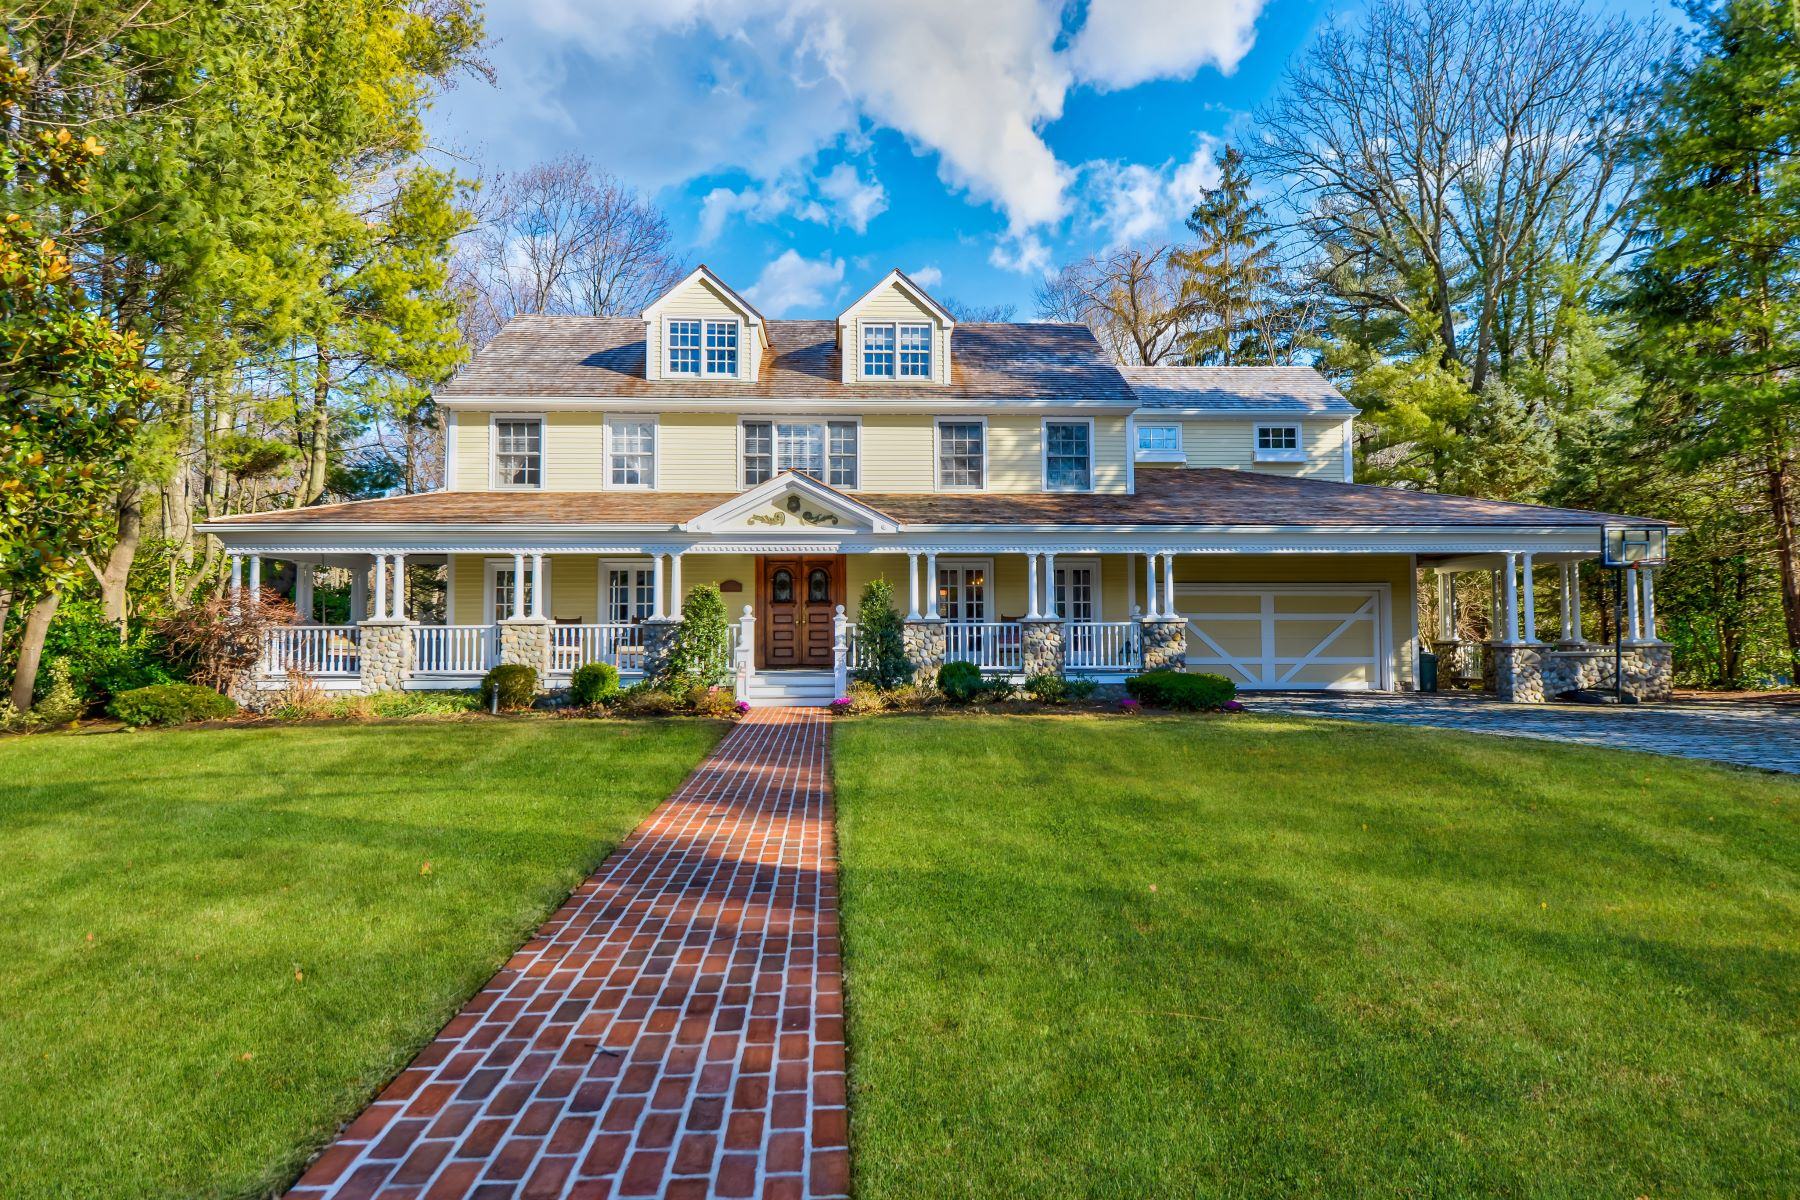 Single Family Homes for Active at Manhasset 88 Brookside Dr Manhasset, New York 11030 United States